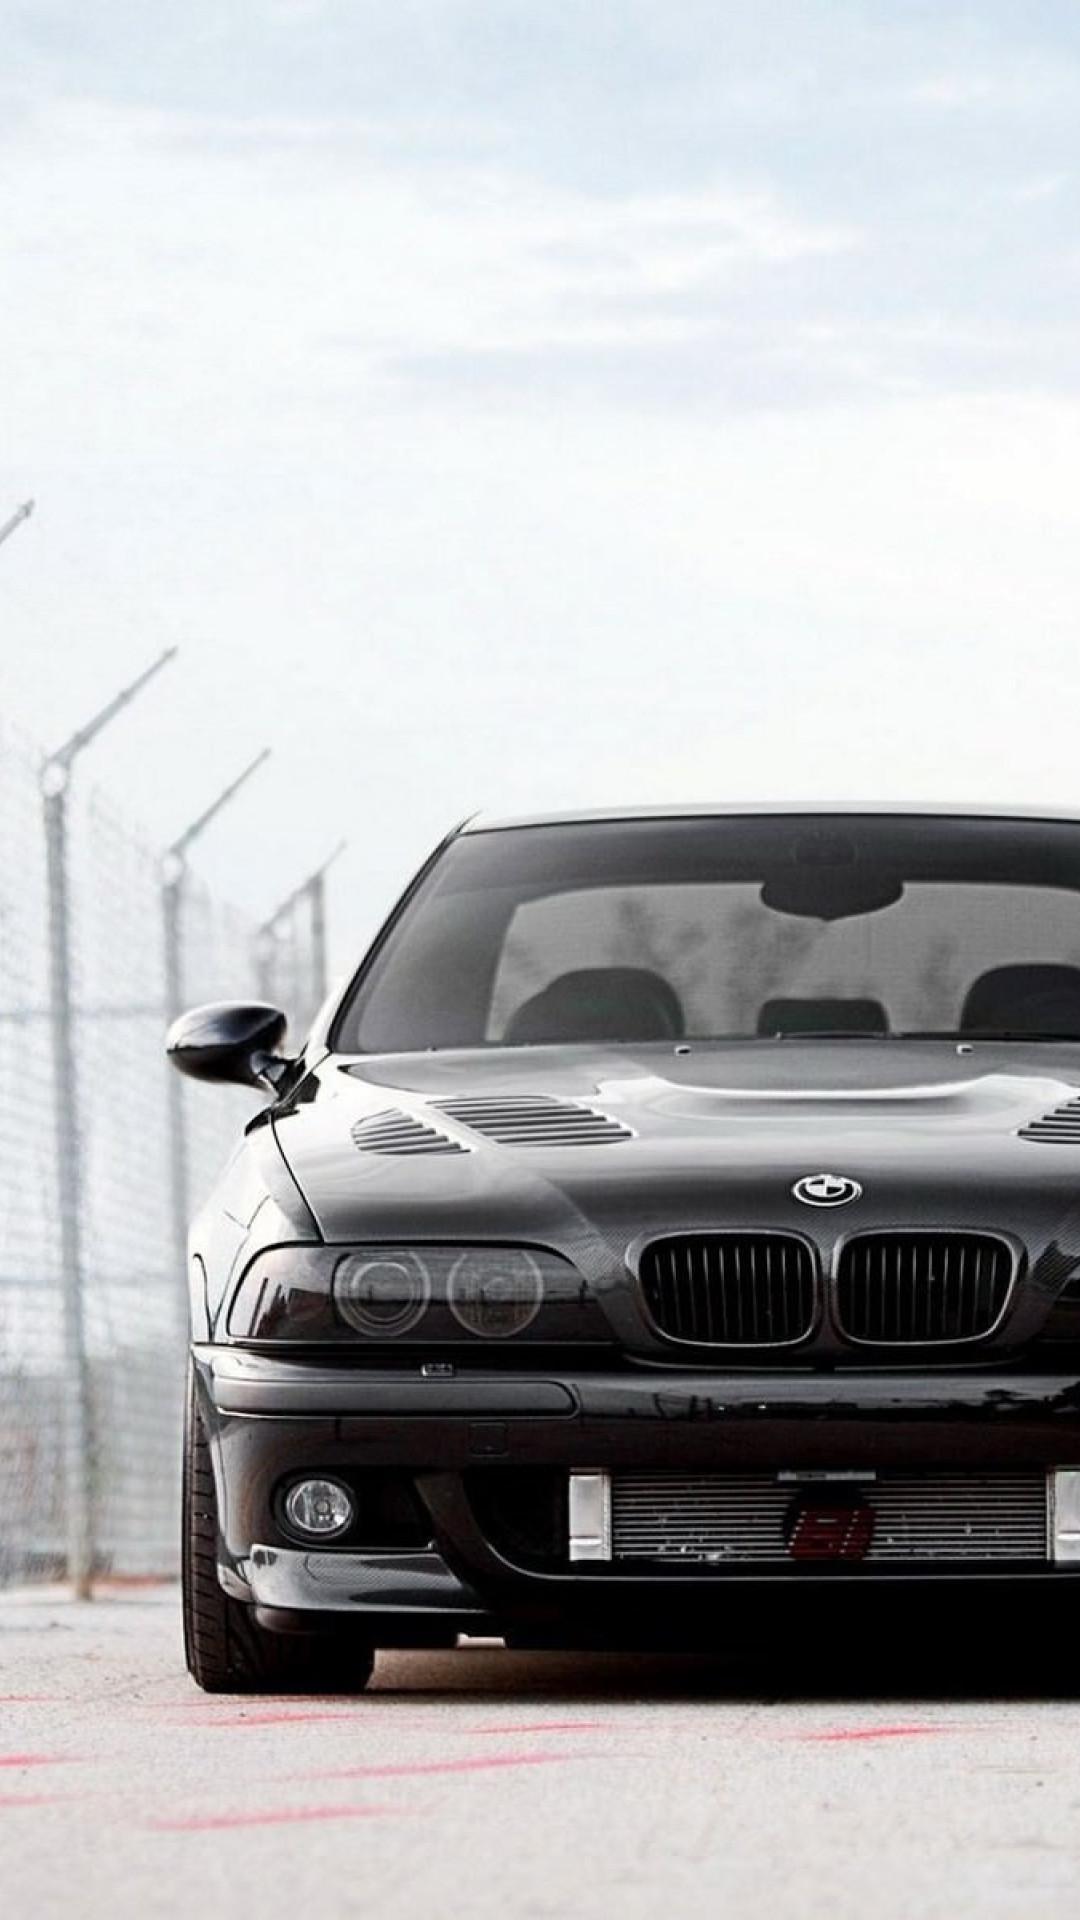 BMW E39 Wallpapers - Wallpaper Cave